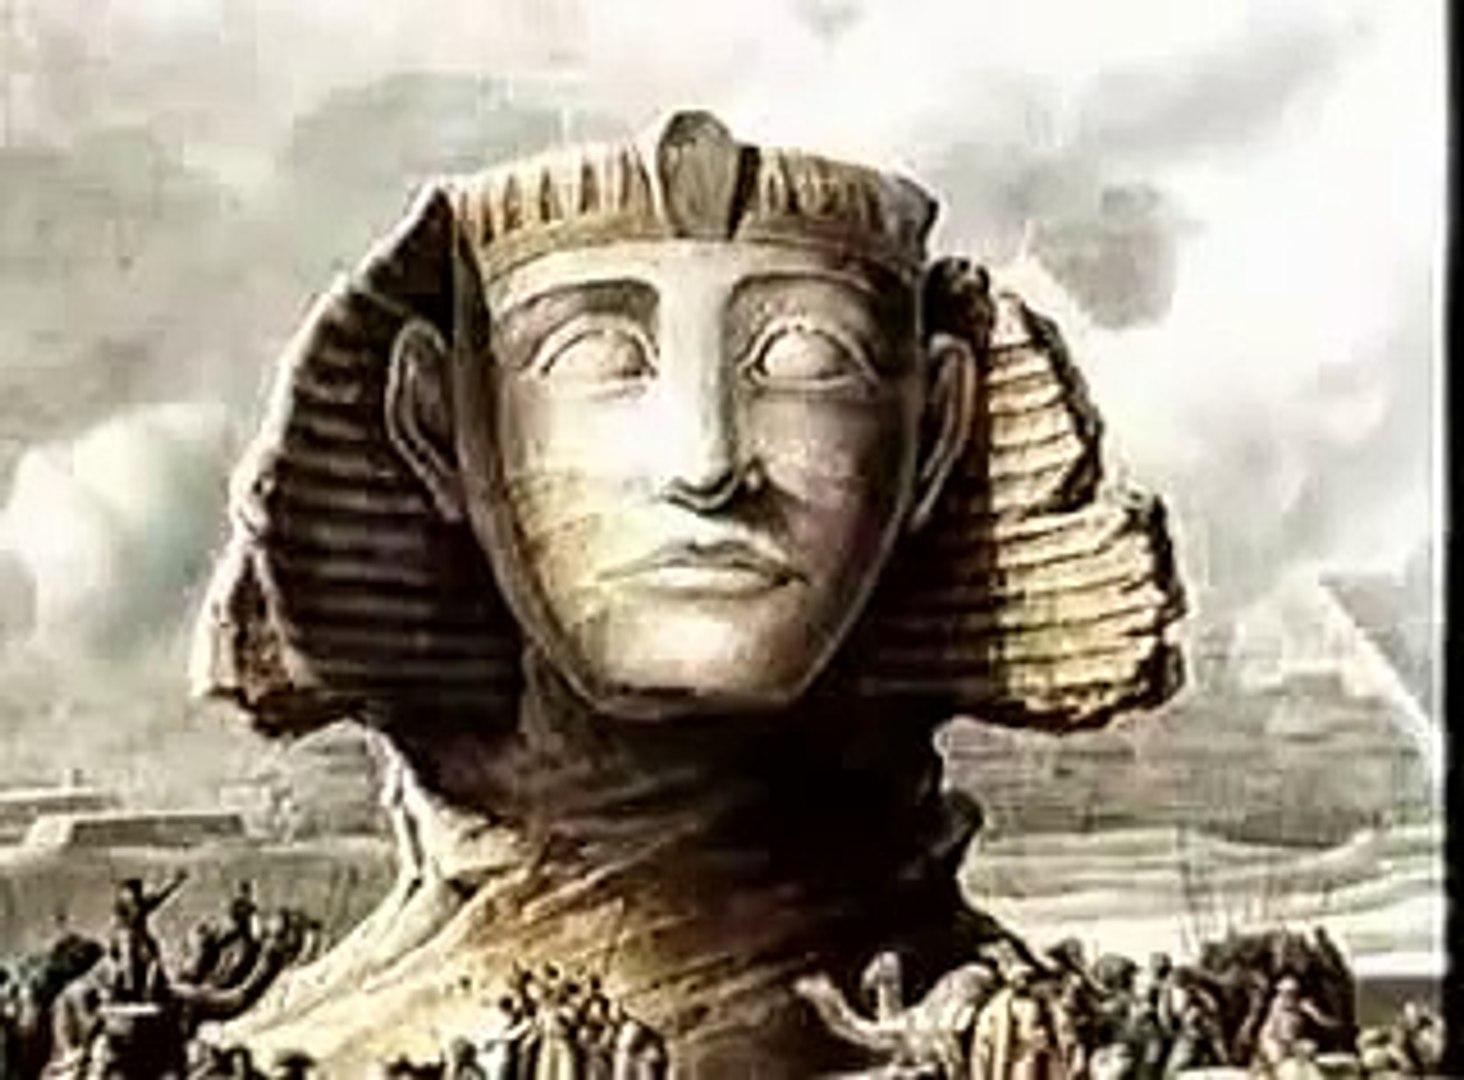 sphinx John west_2_to_AVI_clip0.avi